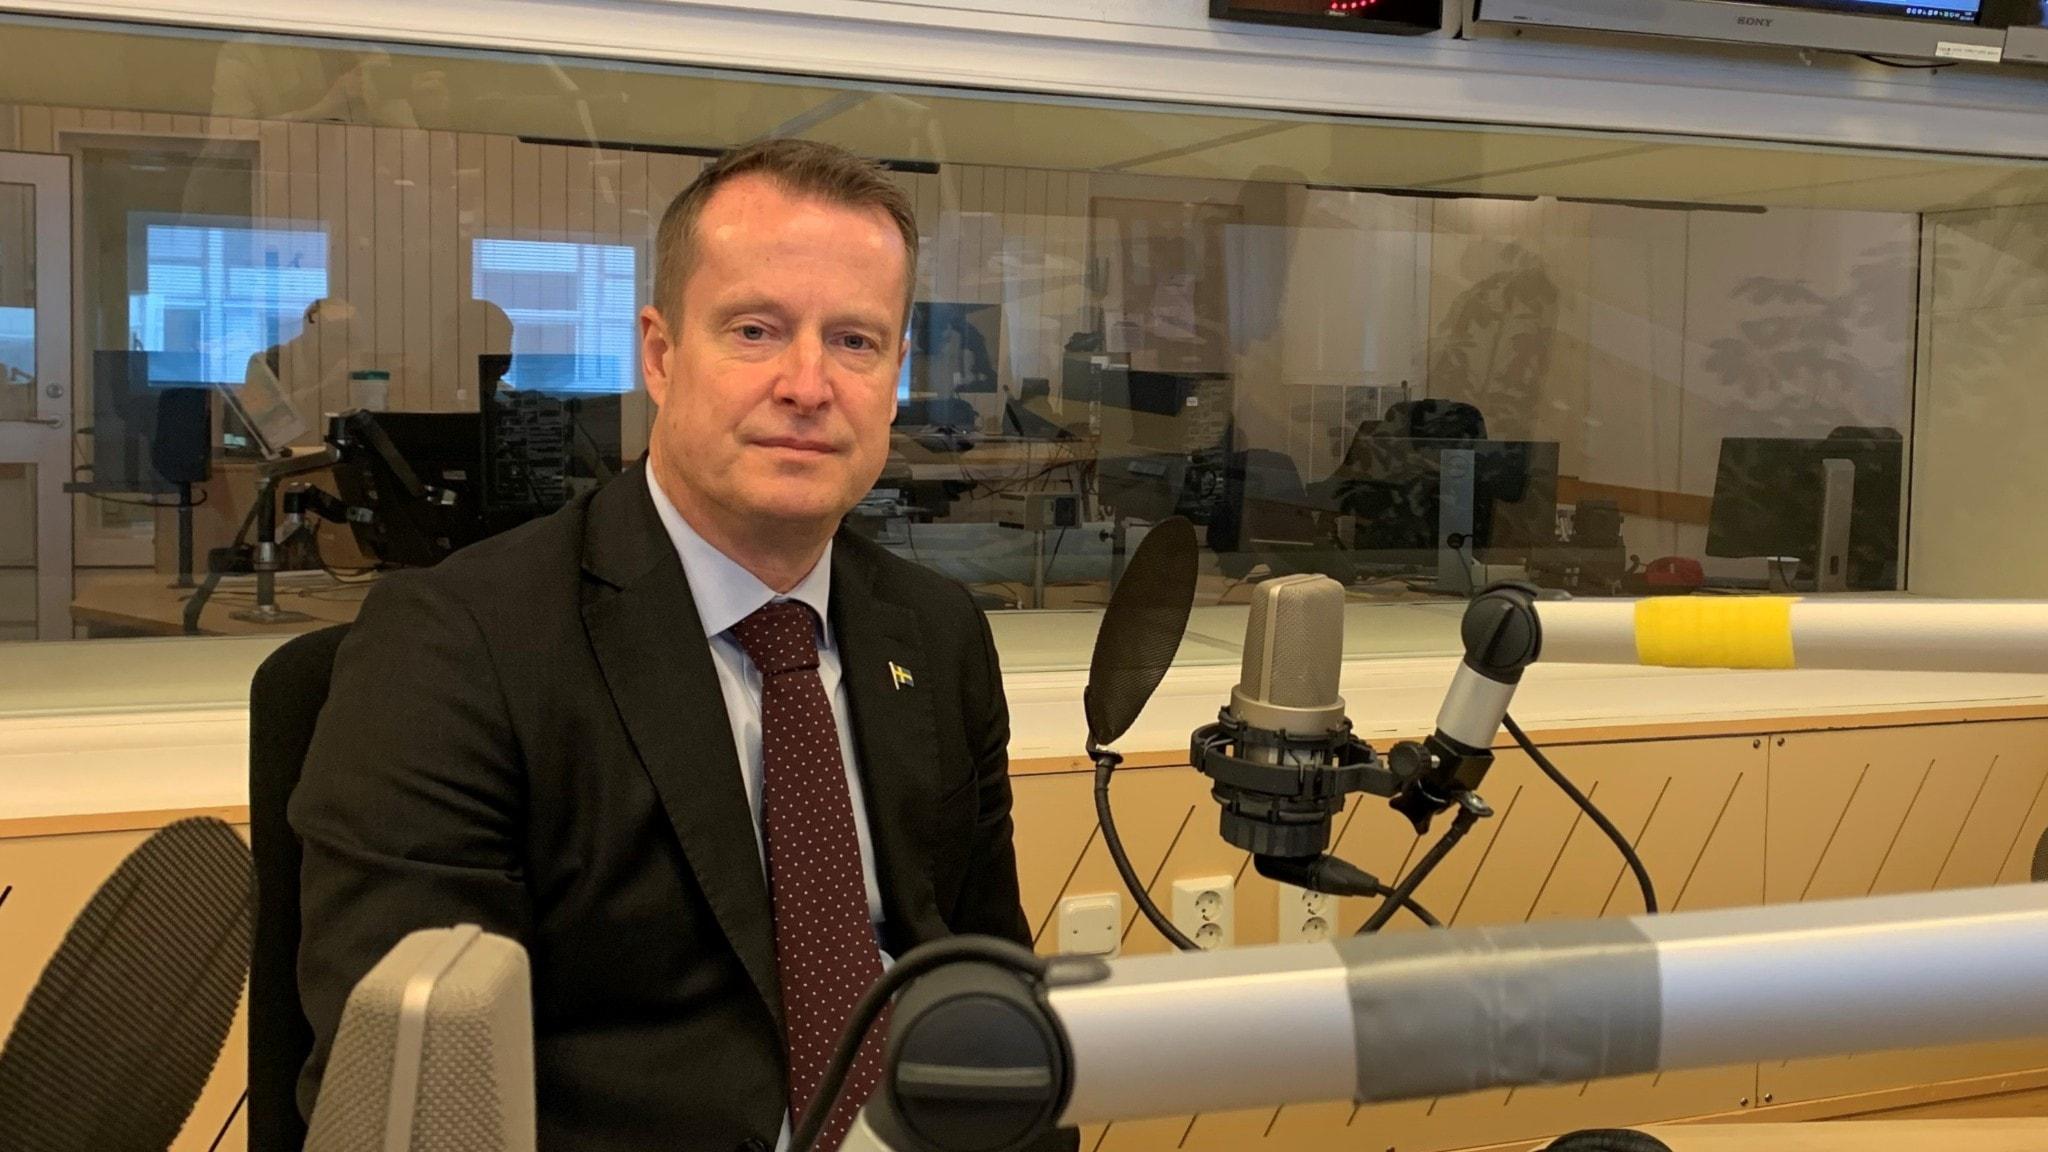 Sveriges energi- och digitaliseringsminister Anders Ygeman (S)